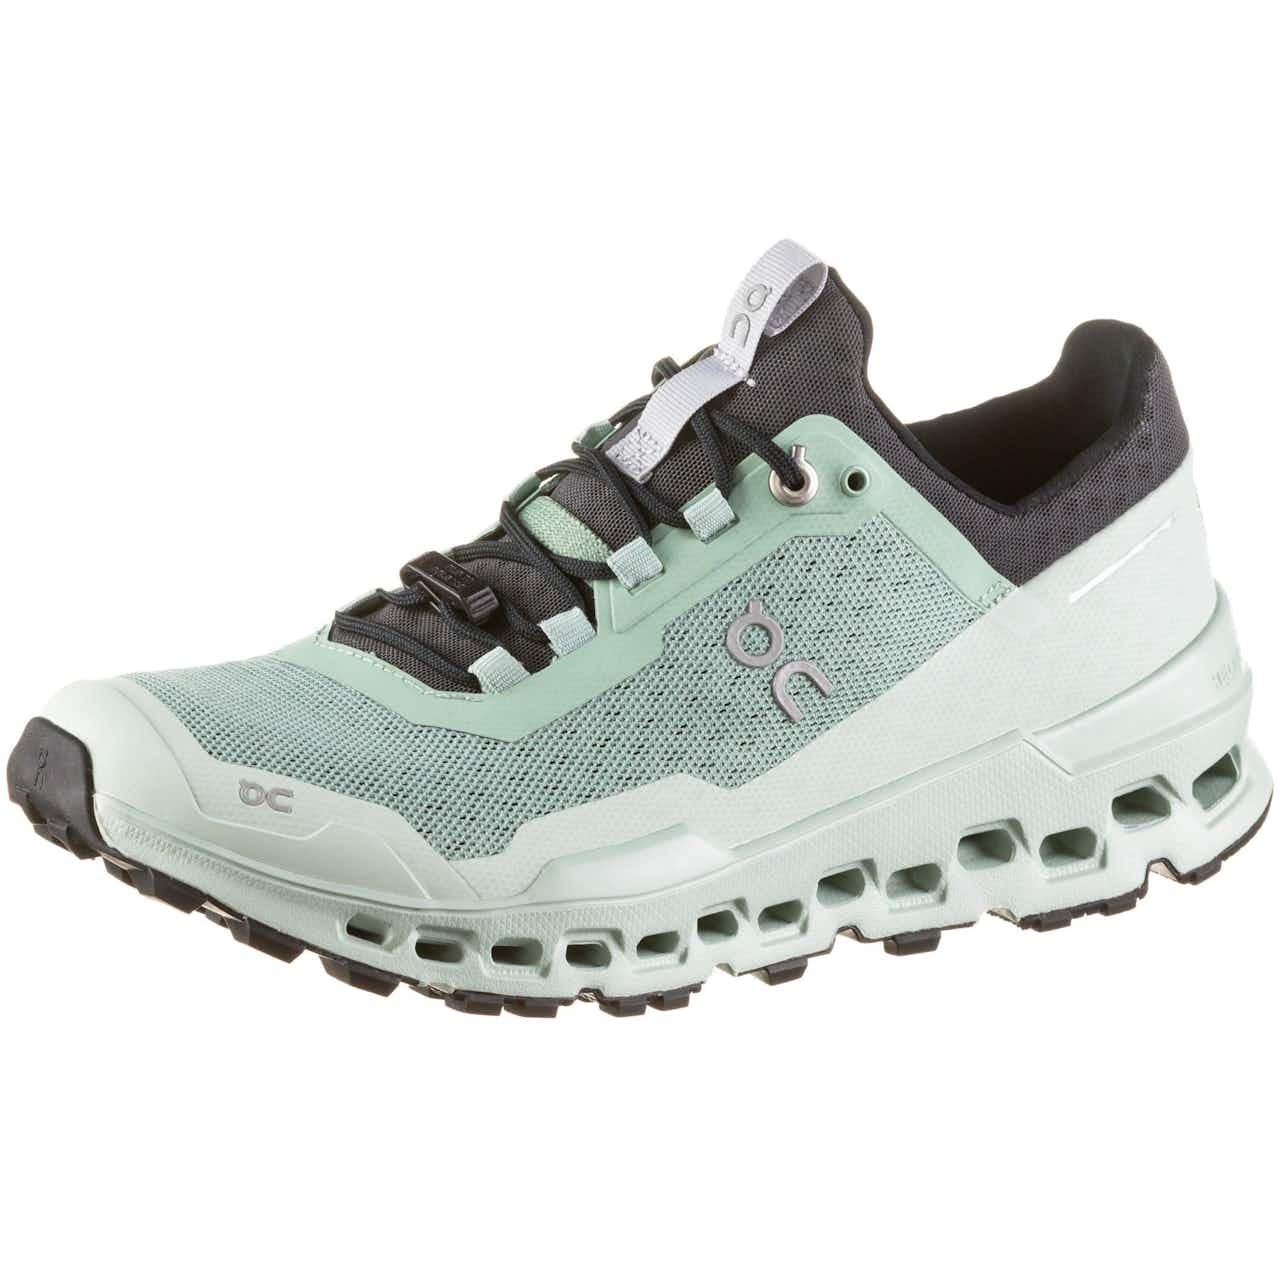 ON Cloudultra Trailrunning Schuhe Damen